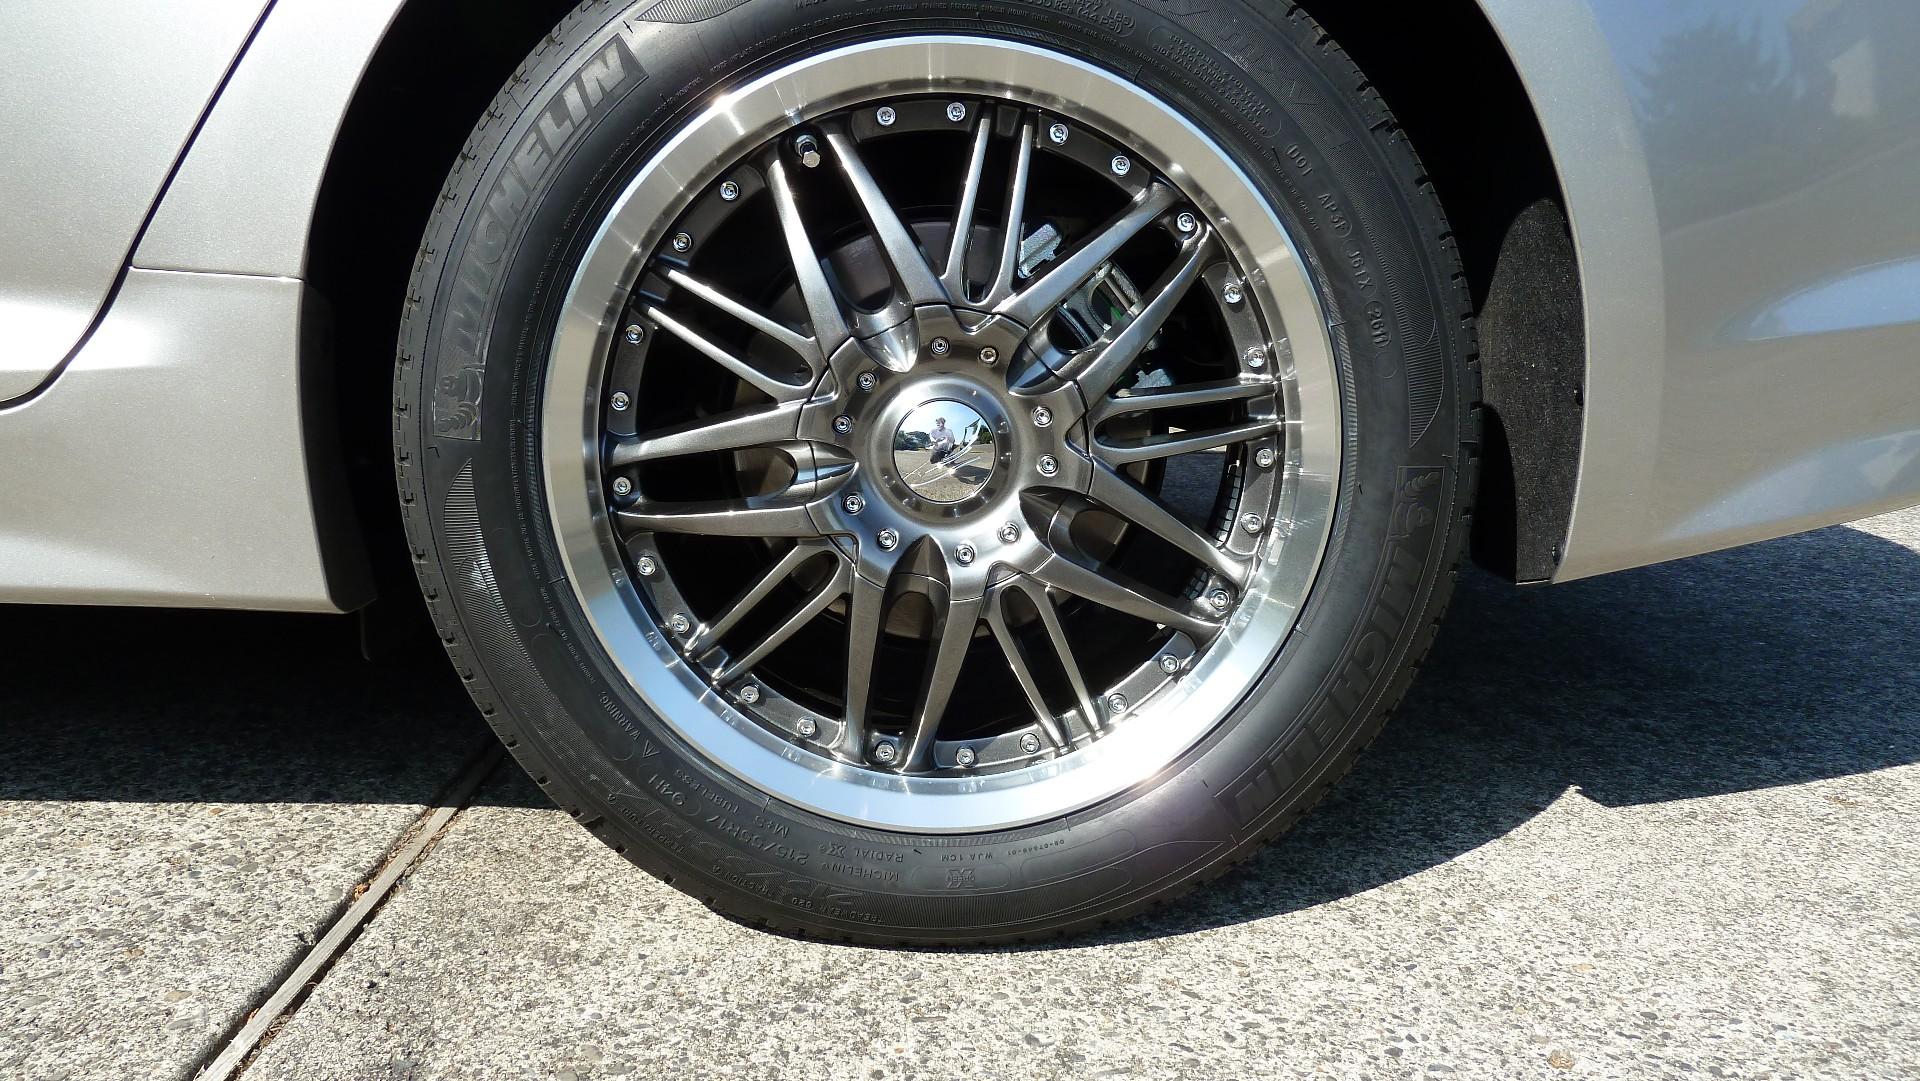 Kia Optima Murdered Out >> Kia Optima custom wheels KMC Rockstar kia t Kia optima